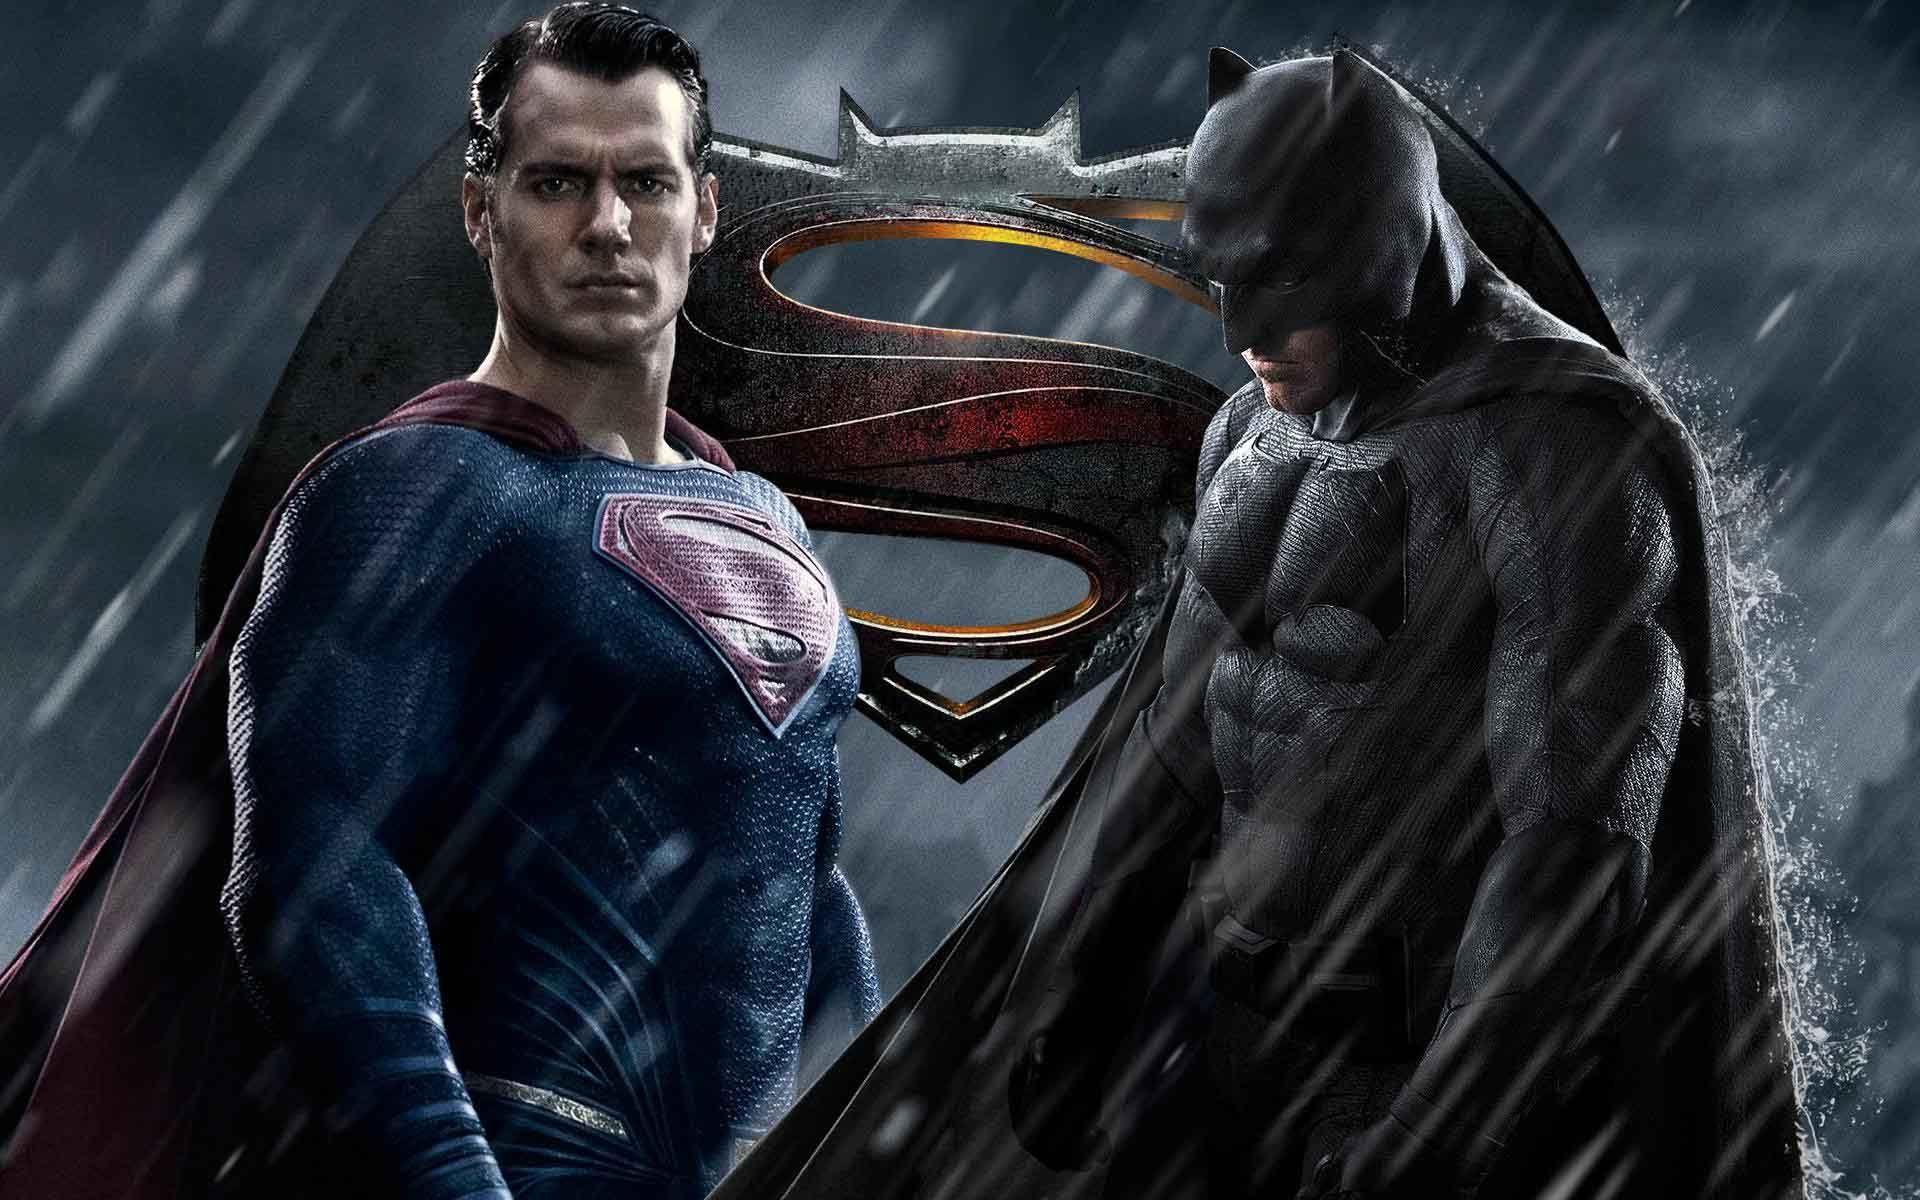 Superman Vs Batman Wallpaper Hd Hd Quality Resolution 1920x1200 Px